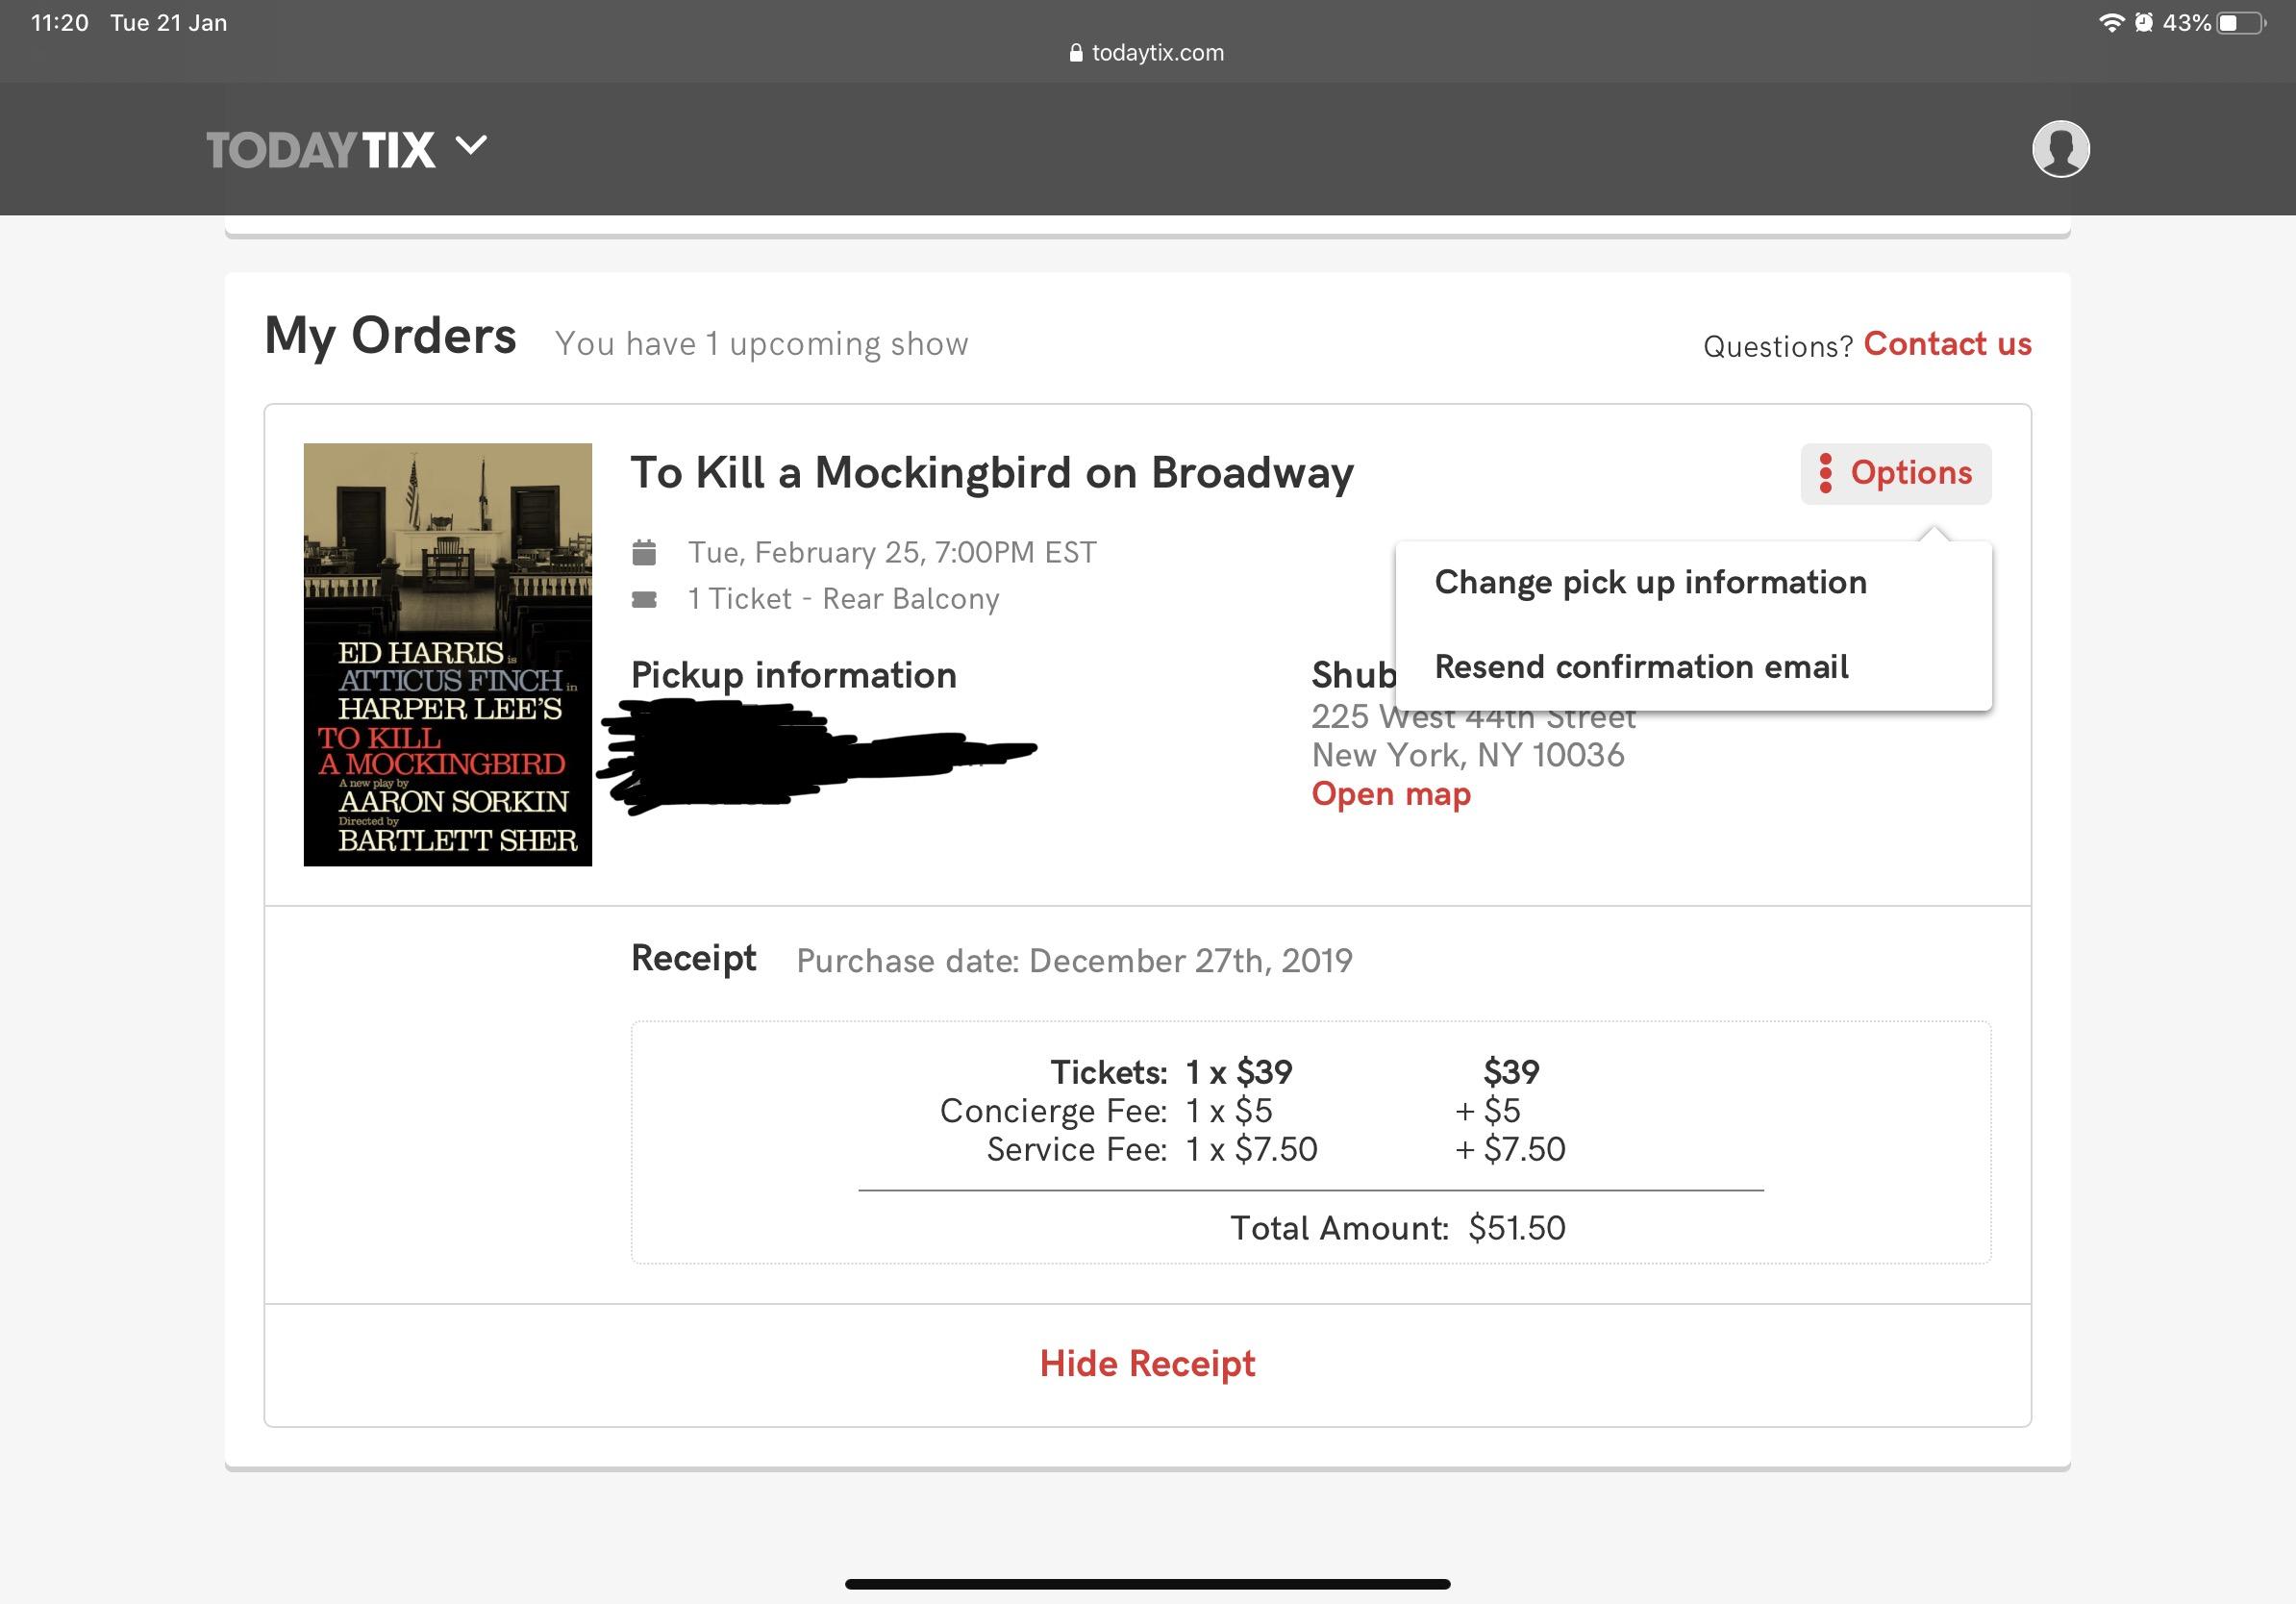 February 25 2020 (7pm) - To Kill a Mockingbird for $40